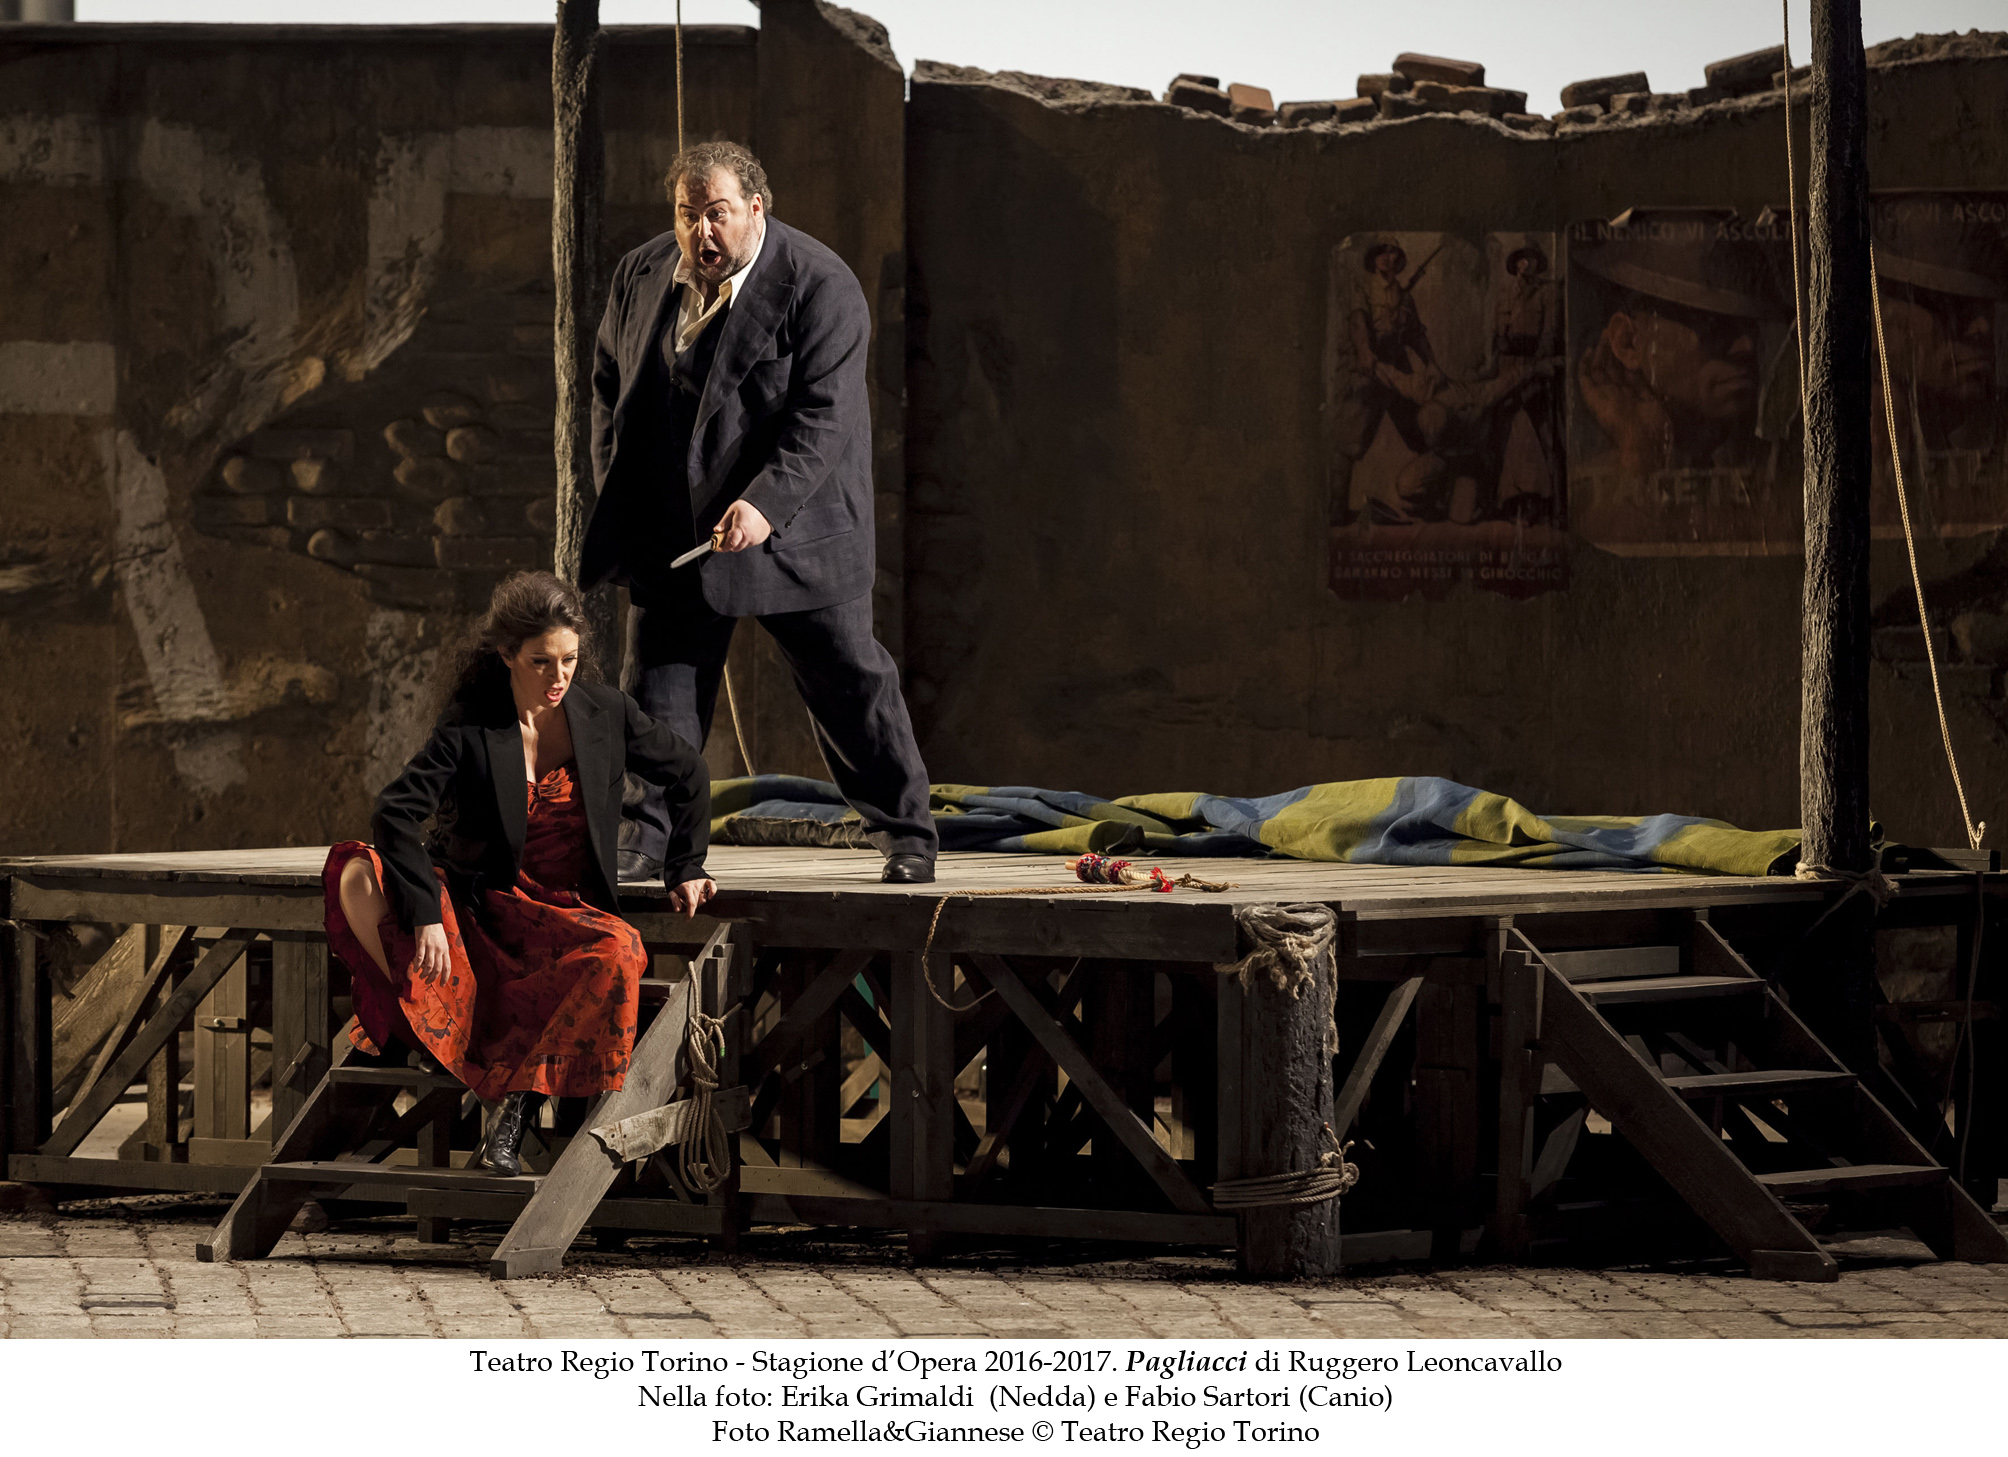 foto Ramella & Giannese